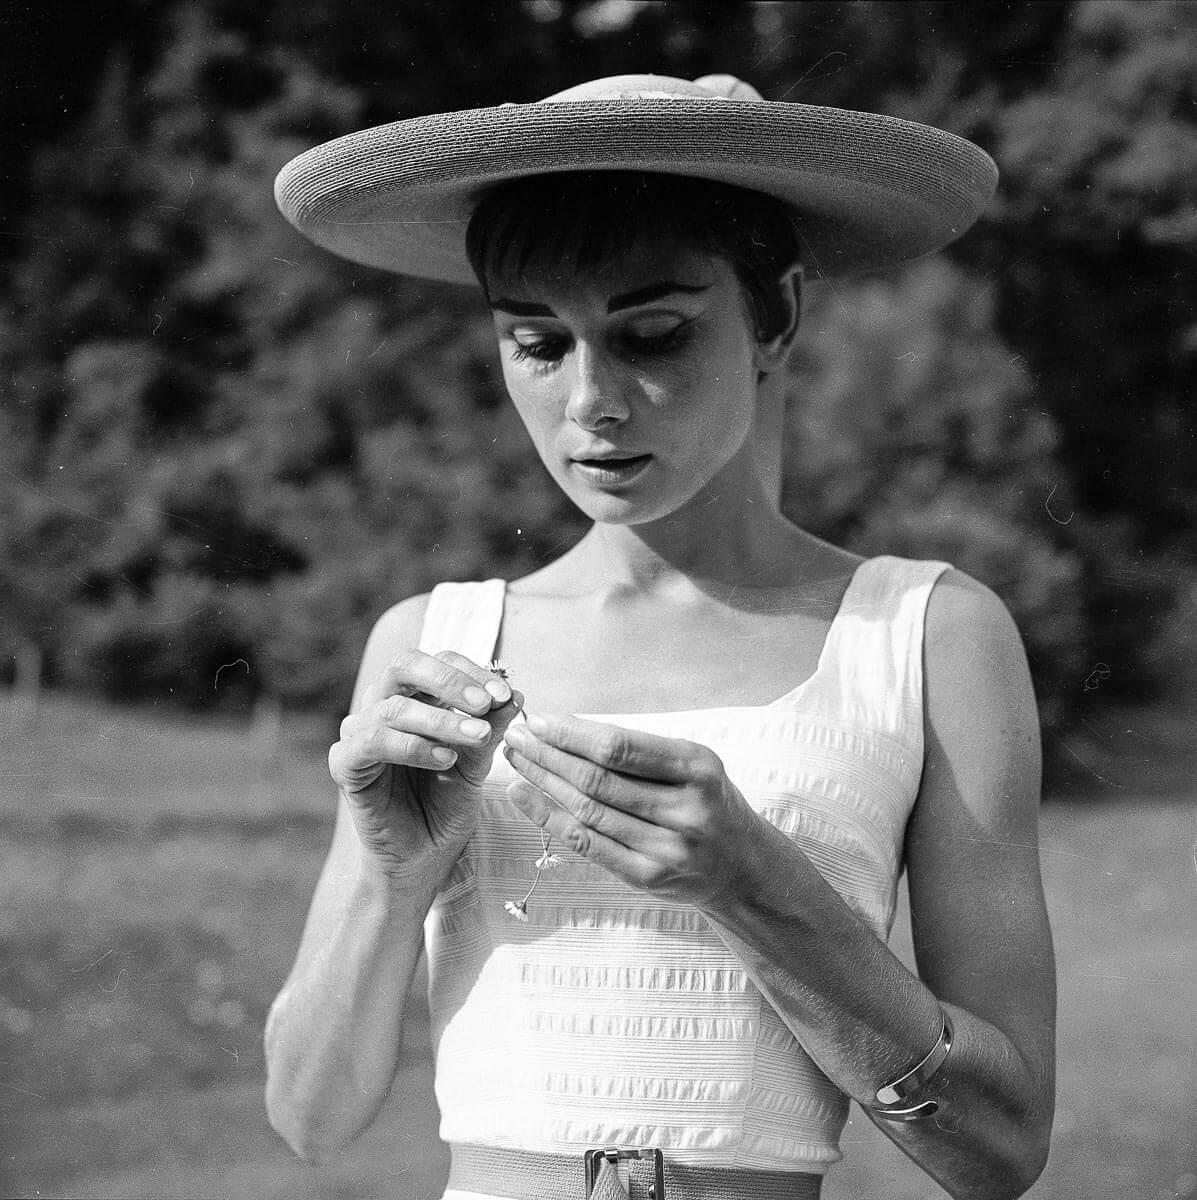 "Stil-Ikone Audrey Hepburn in der Schweiz, 1954. Foto: Hans Gerber, CC BY-SA 4.0 · <a href=""http://doi.org/10.3932/ethz-a-000105877"" target=""_blank"" rel=""noopener"">http://doi.org/10.3932/ethz-a-000105877</a> · <a href=""https://commons.wikimedia.org/w/index.php?curid=42574918"" target=""_blank"" rel=""noopener"">https://commons.wikimedia.org/w/index.php?curid=42574918</a>"